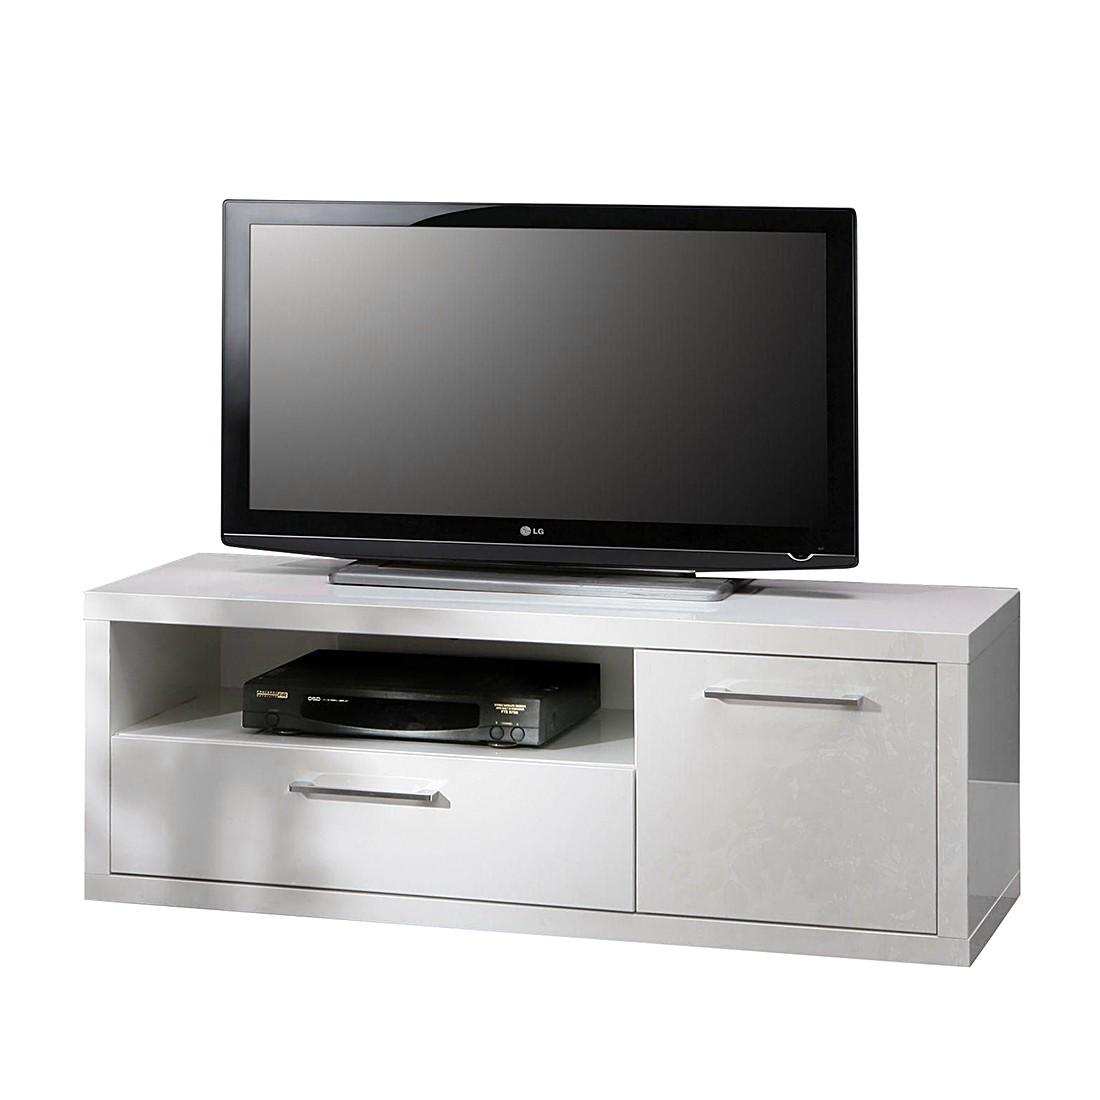 TV-Lowboard Fresno I – Hochglanz Weiß, mooved online kaufen